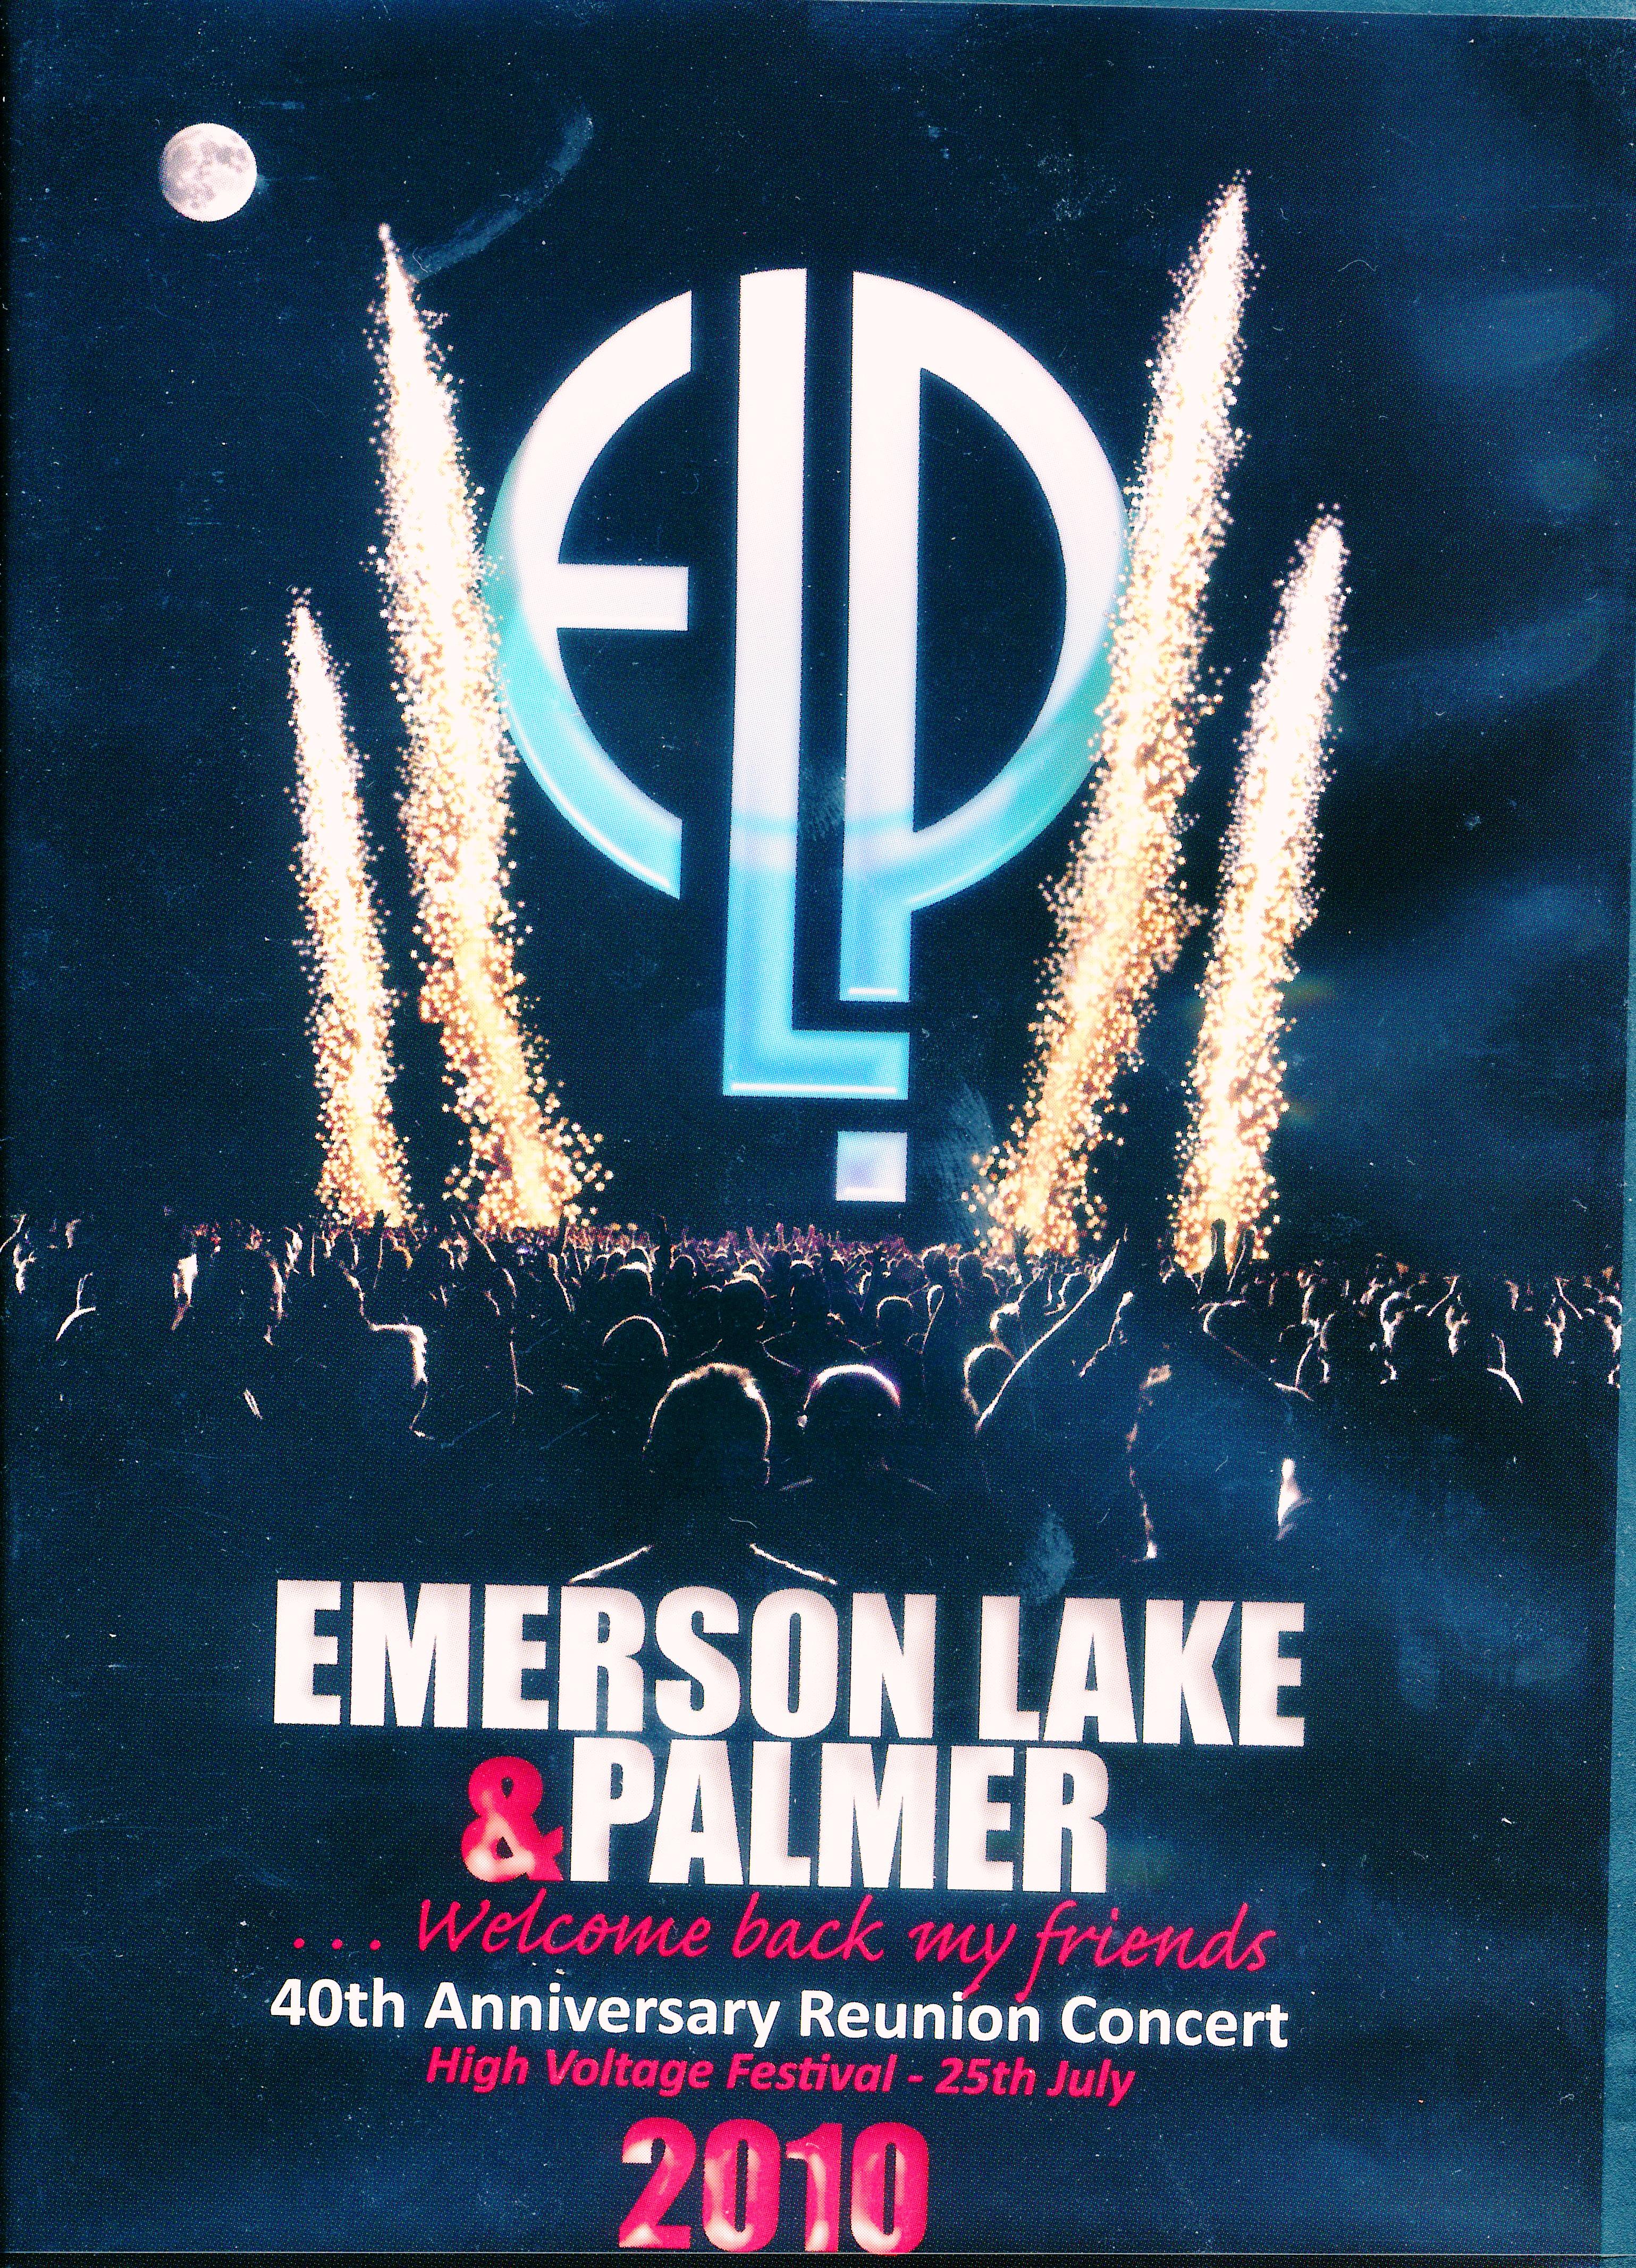 Elp Reunion Tour